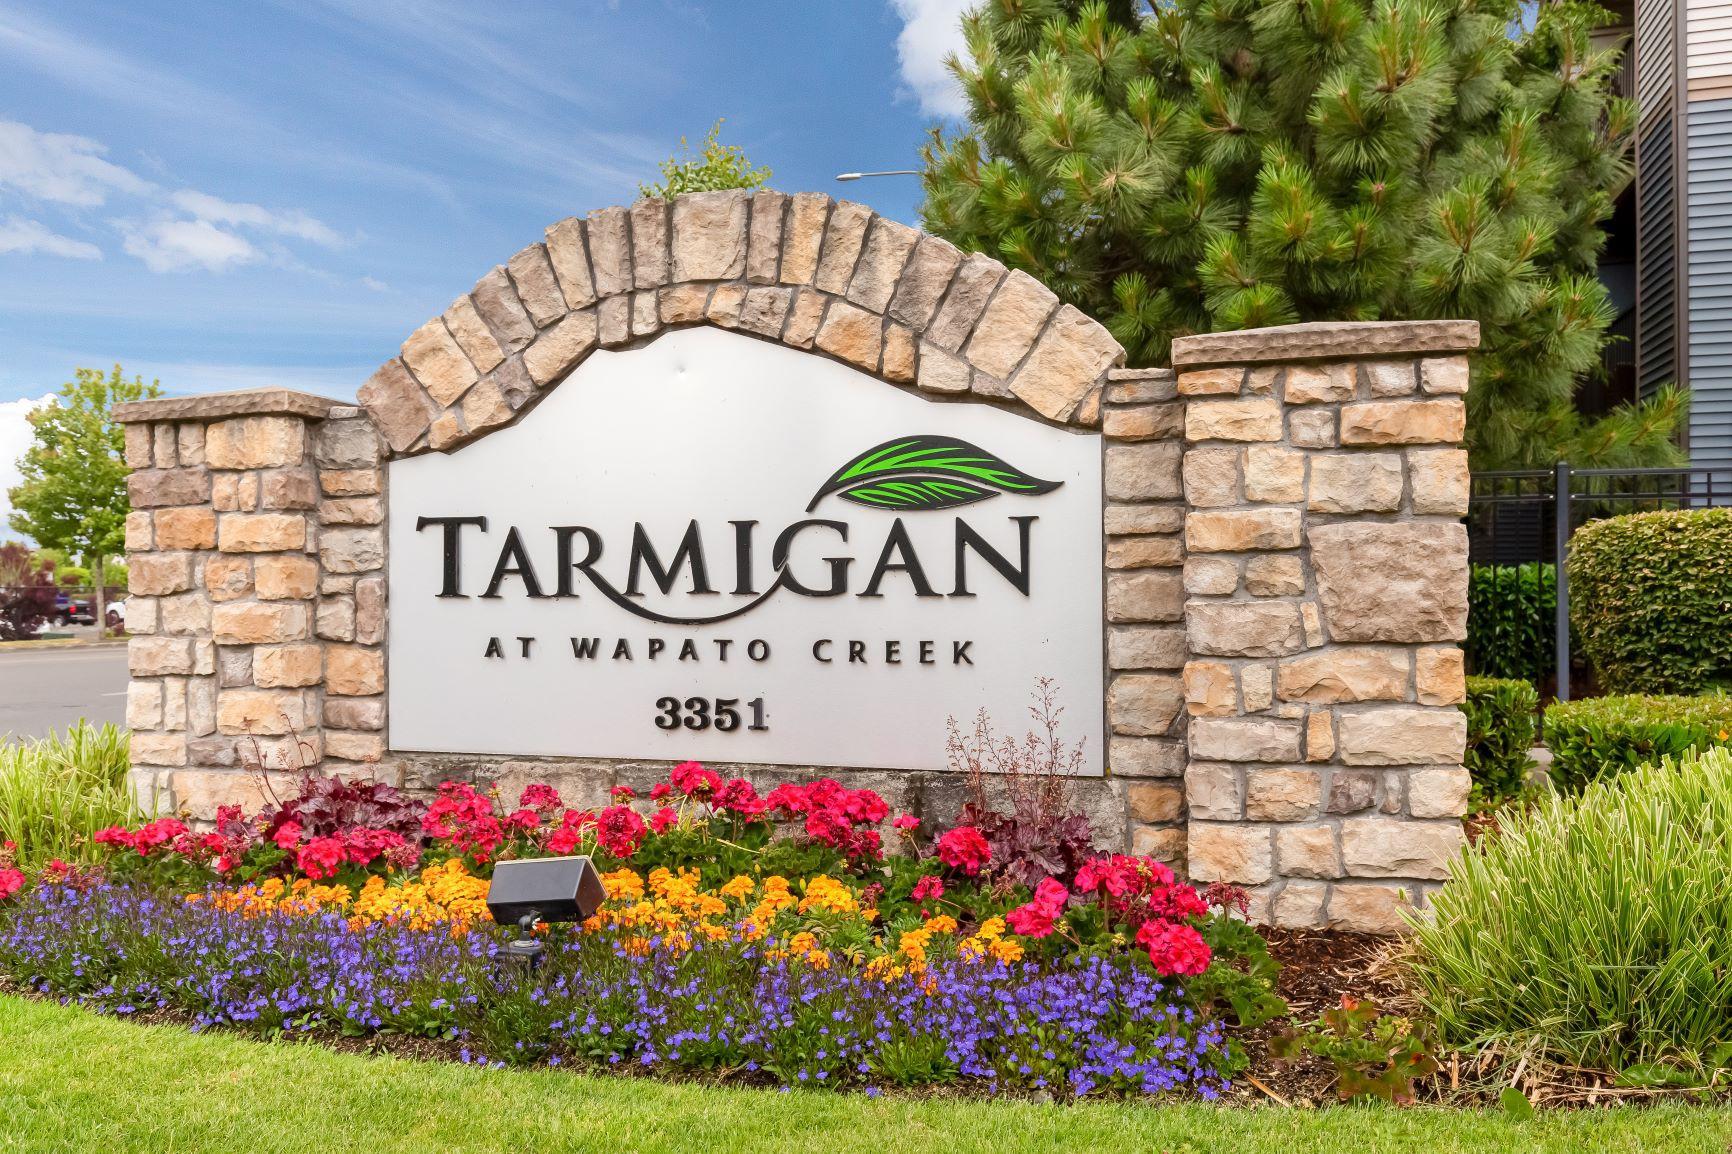 Apartments Near PLU Tarmigan at Wapato Creek for Pacific Lutheran University Students in Tacoma, WA